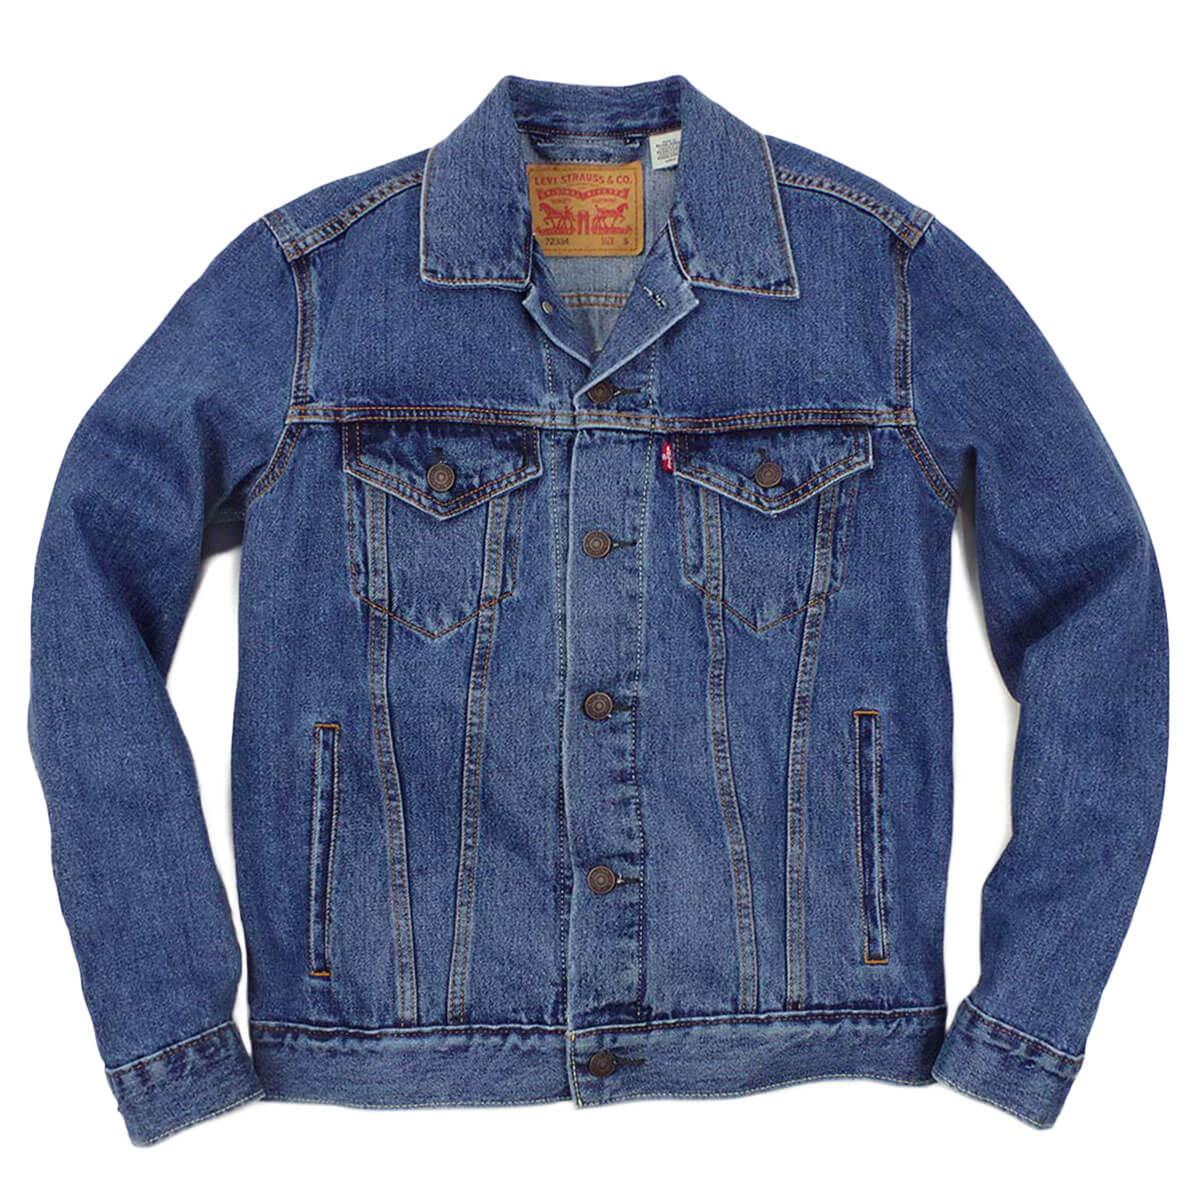 8ceec75a912d79 Levis LEVI' S #72334 denim jacket the trucker medium stone wash (THE TRUCKER  ...